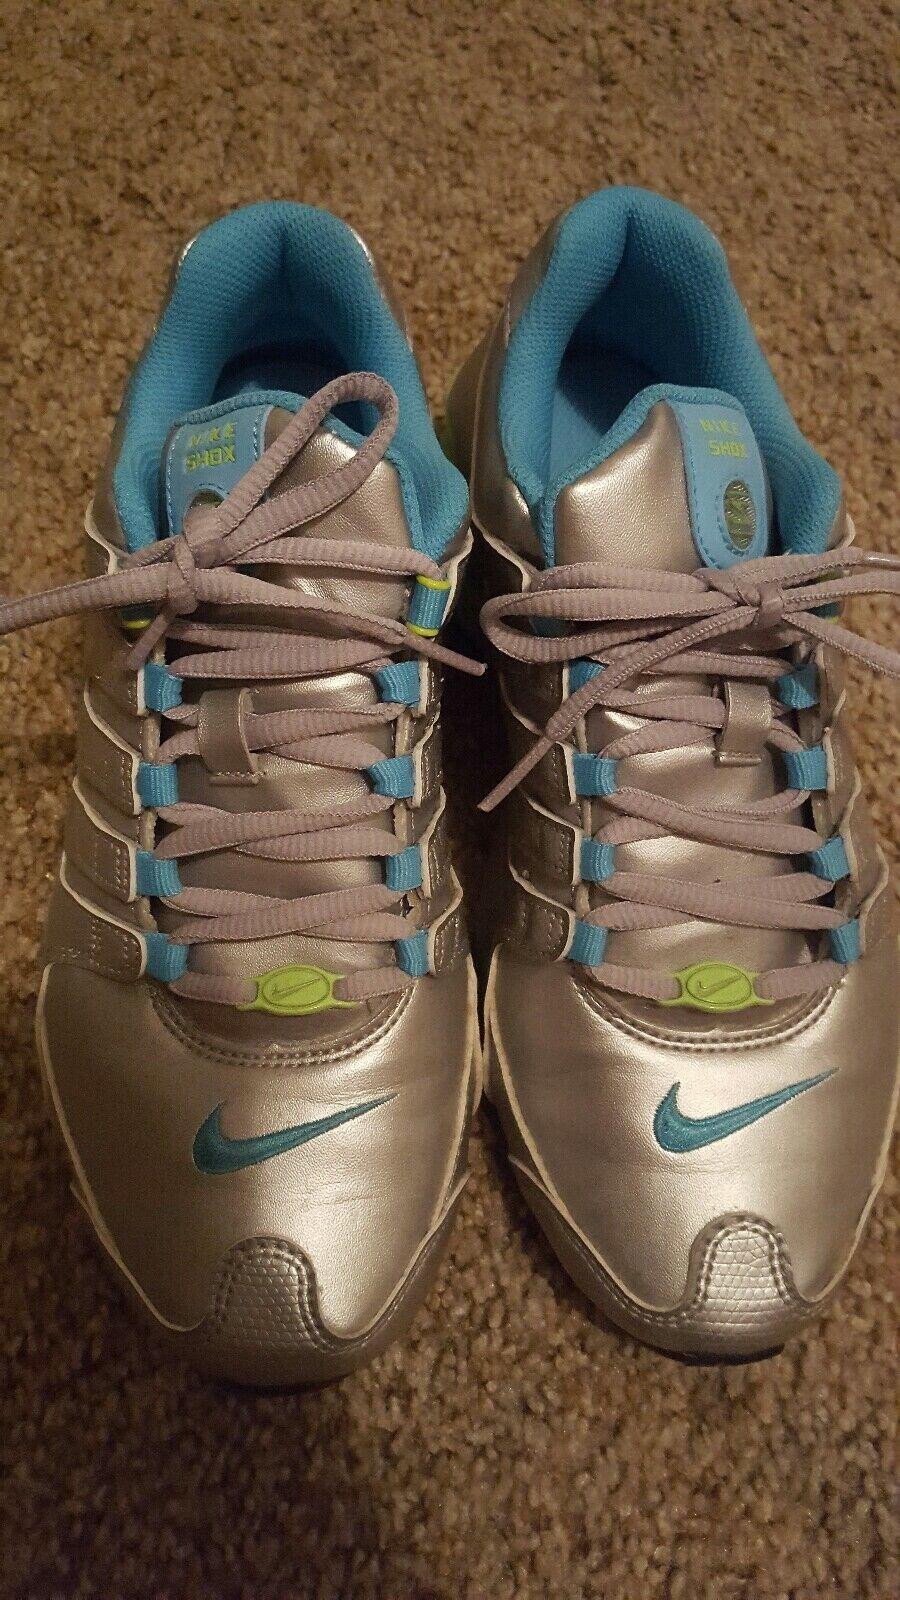 Womens Nike Shox NZ Sneakers Silver bluee Lime worn 2 times.  LN beautiful